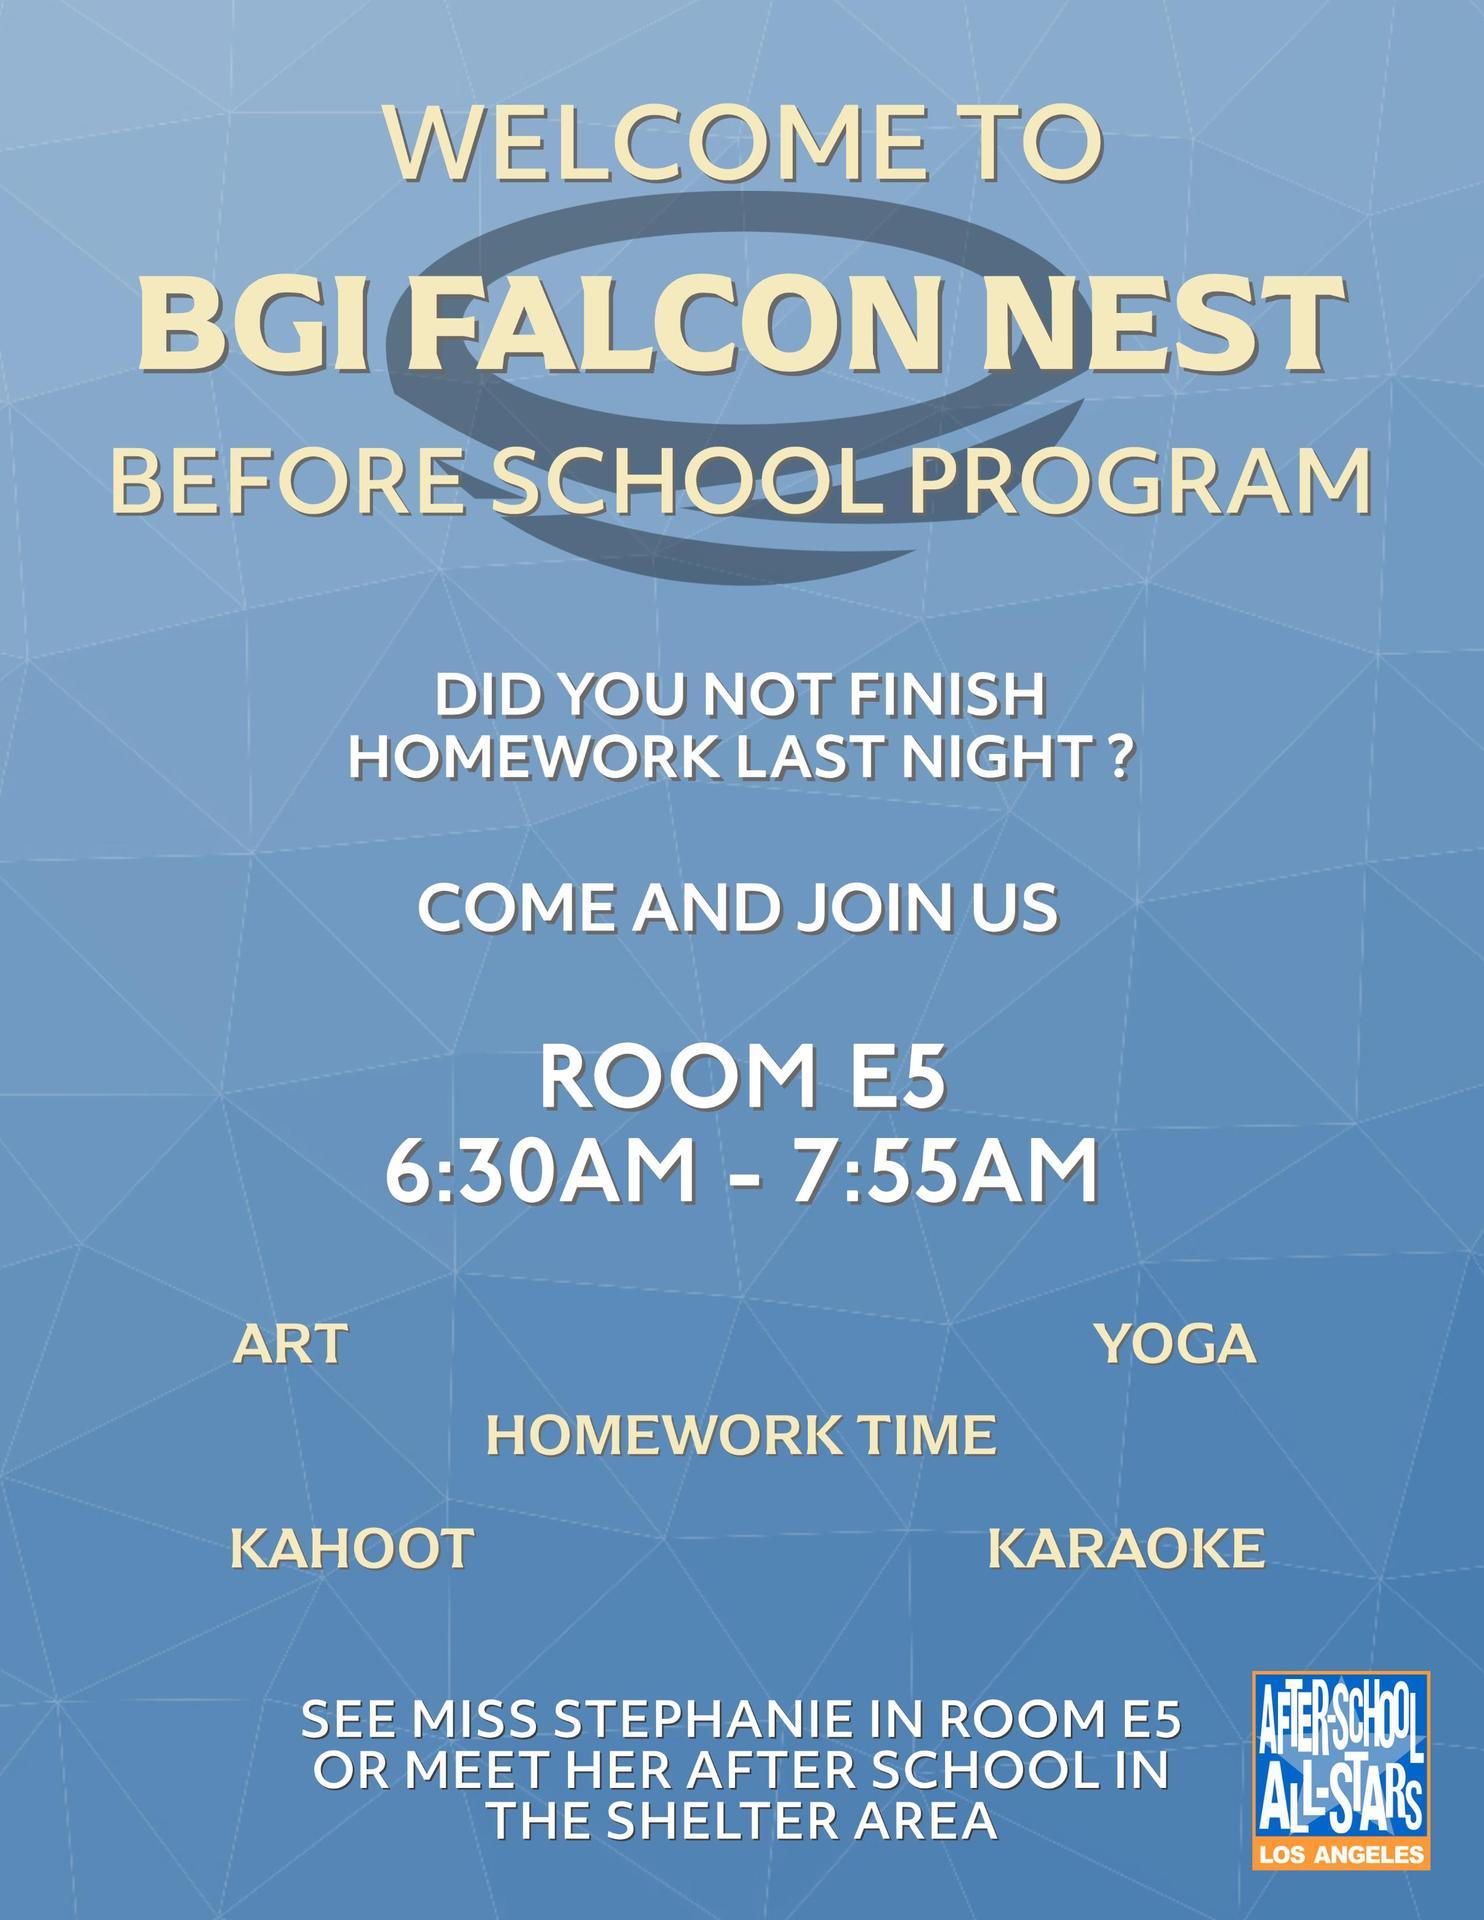 BGI All-Stars Nest Flyer